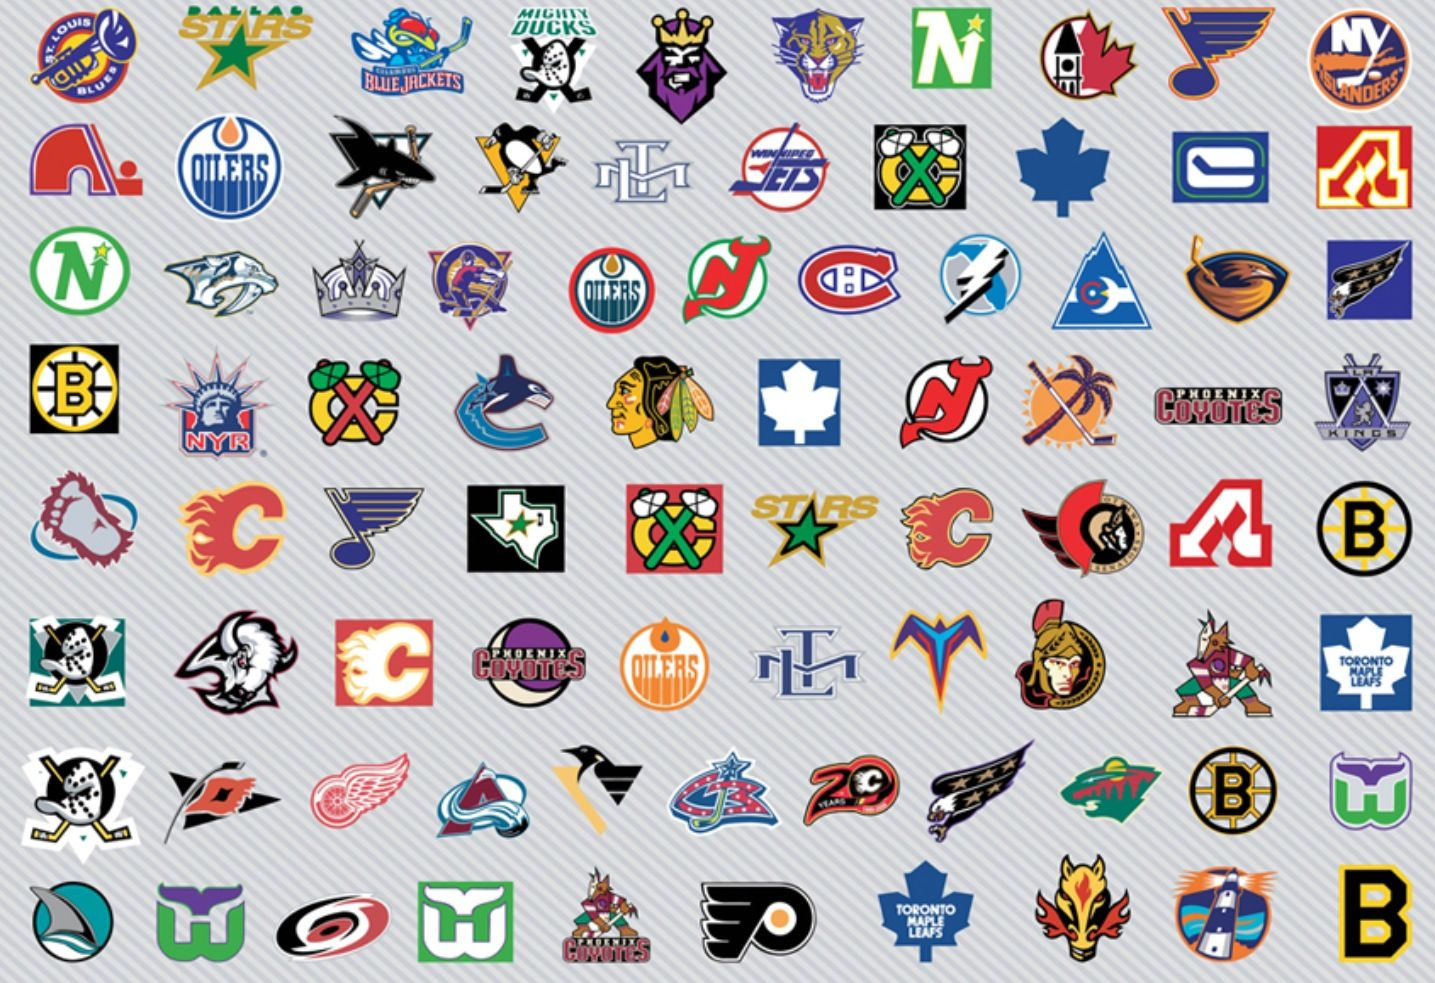 Nhl Logos Hockey Logos Nhl Hockey Teams Nhl Hockey